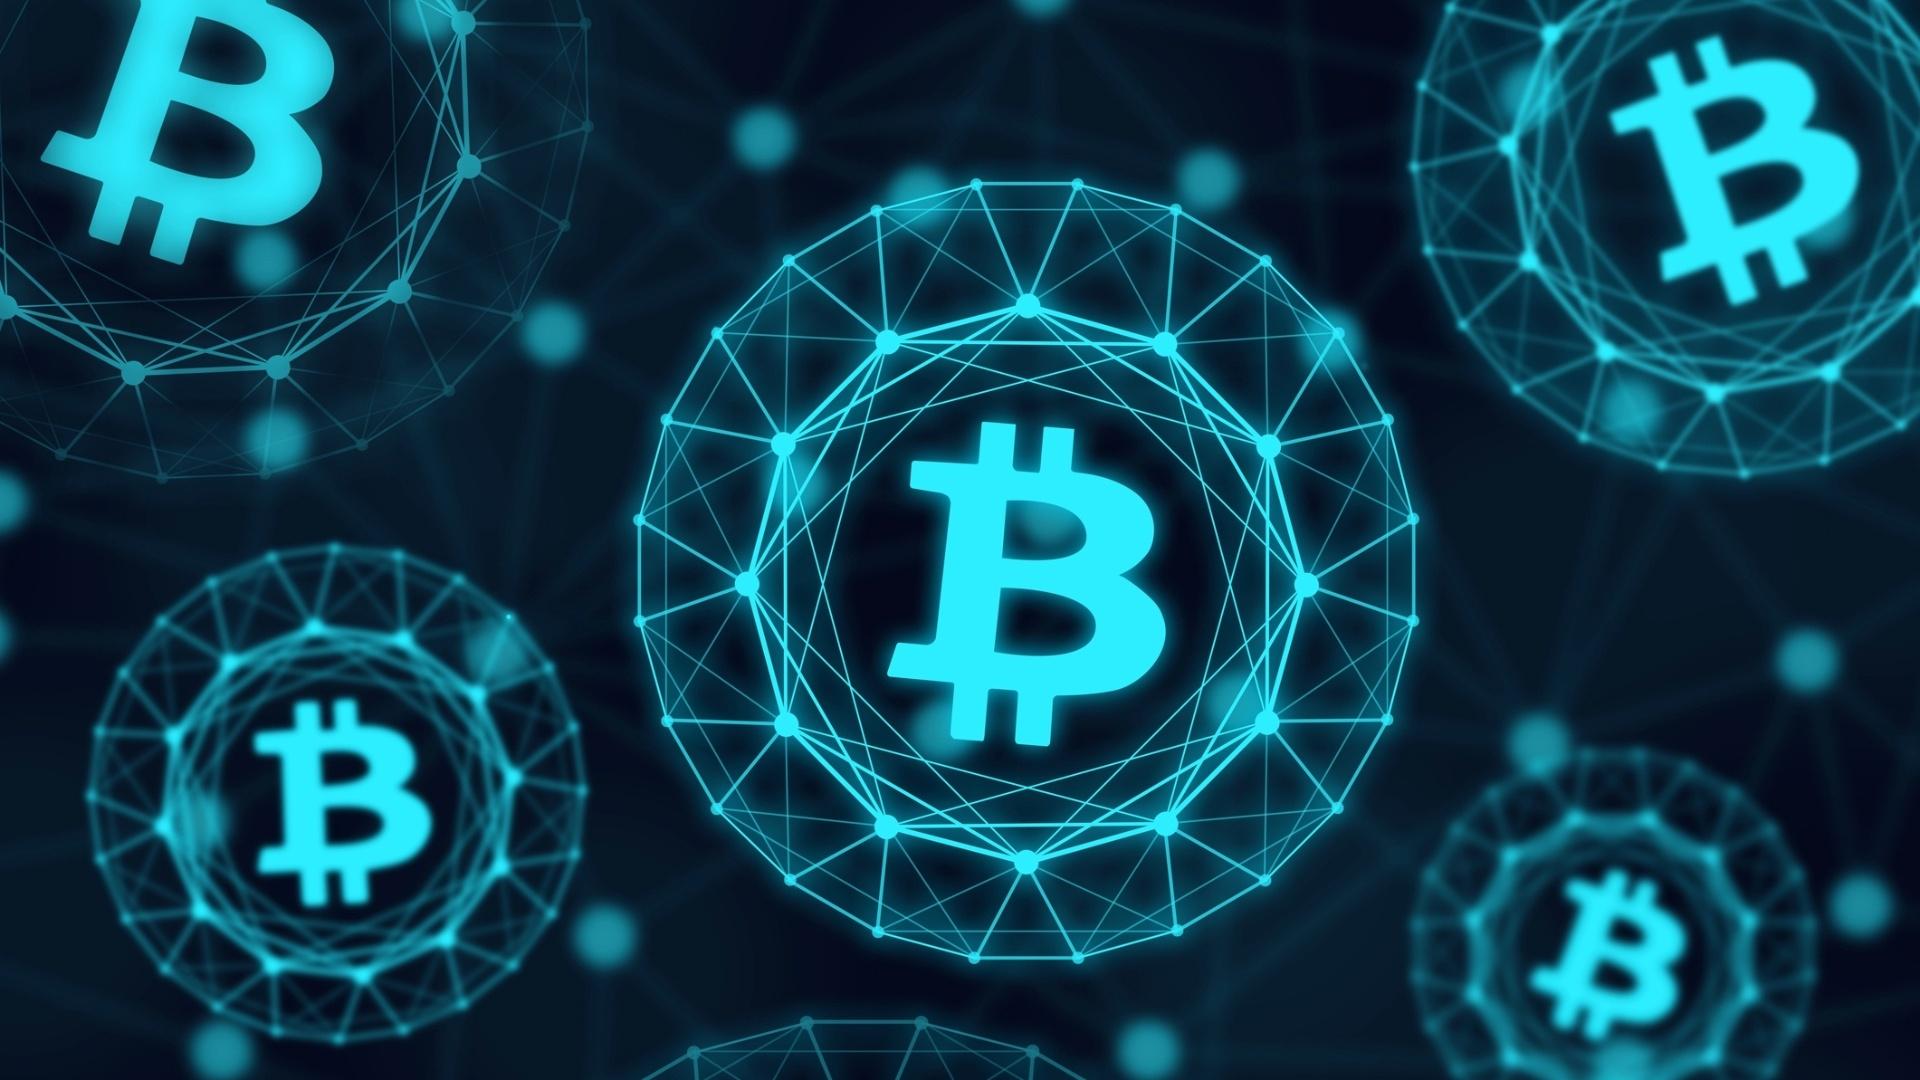 Quanto vale o bitcoin?